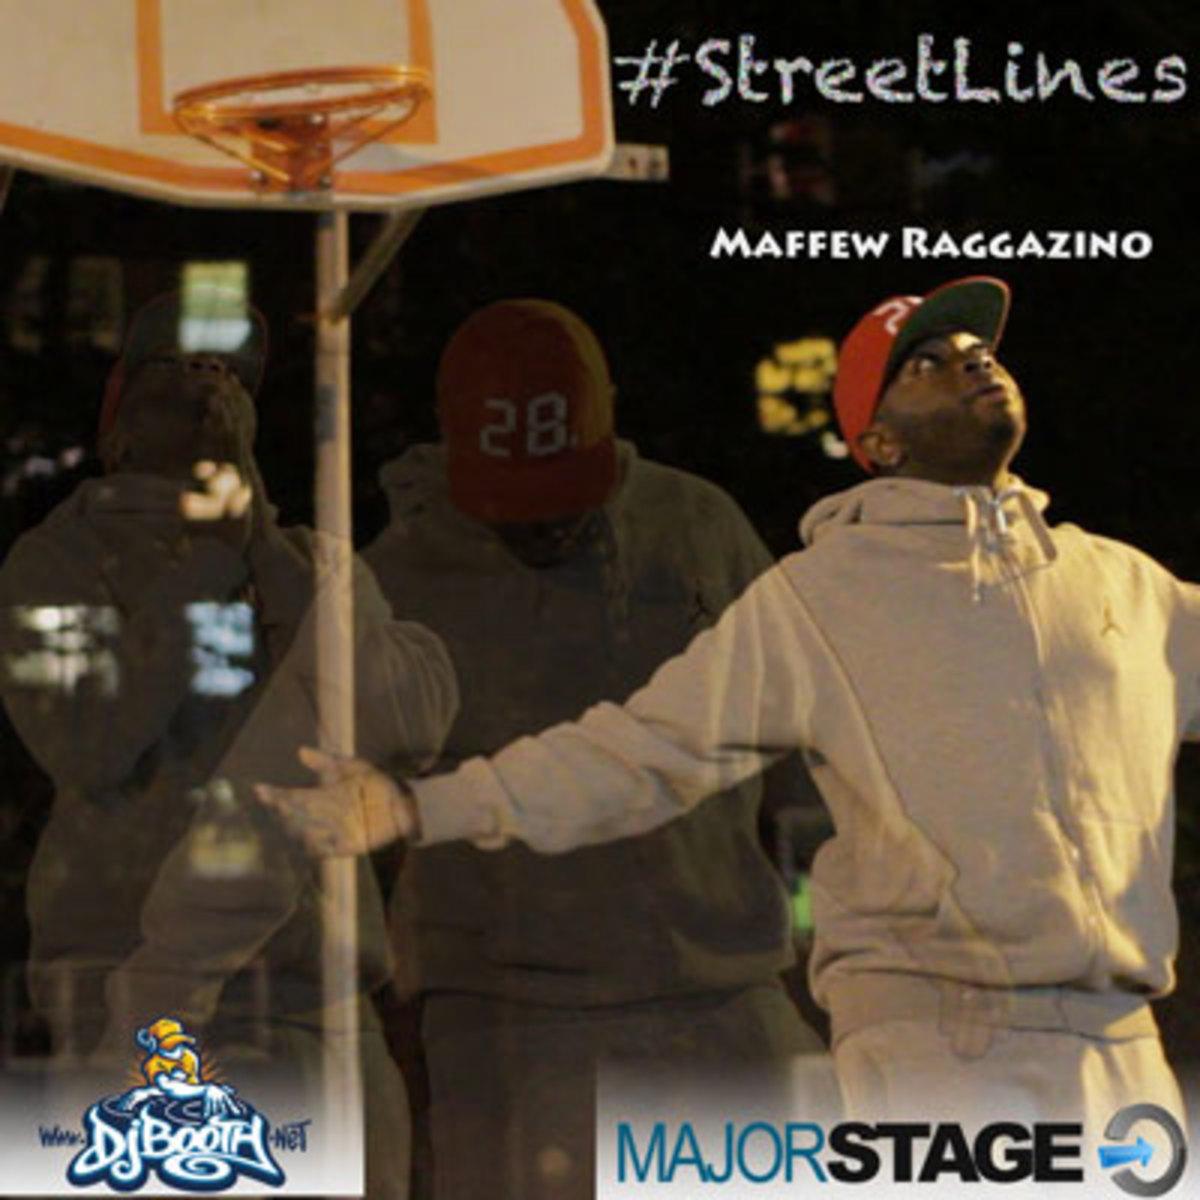 maffewrag-streetlines.jpg